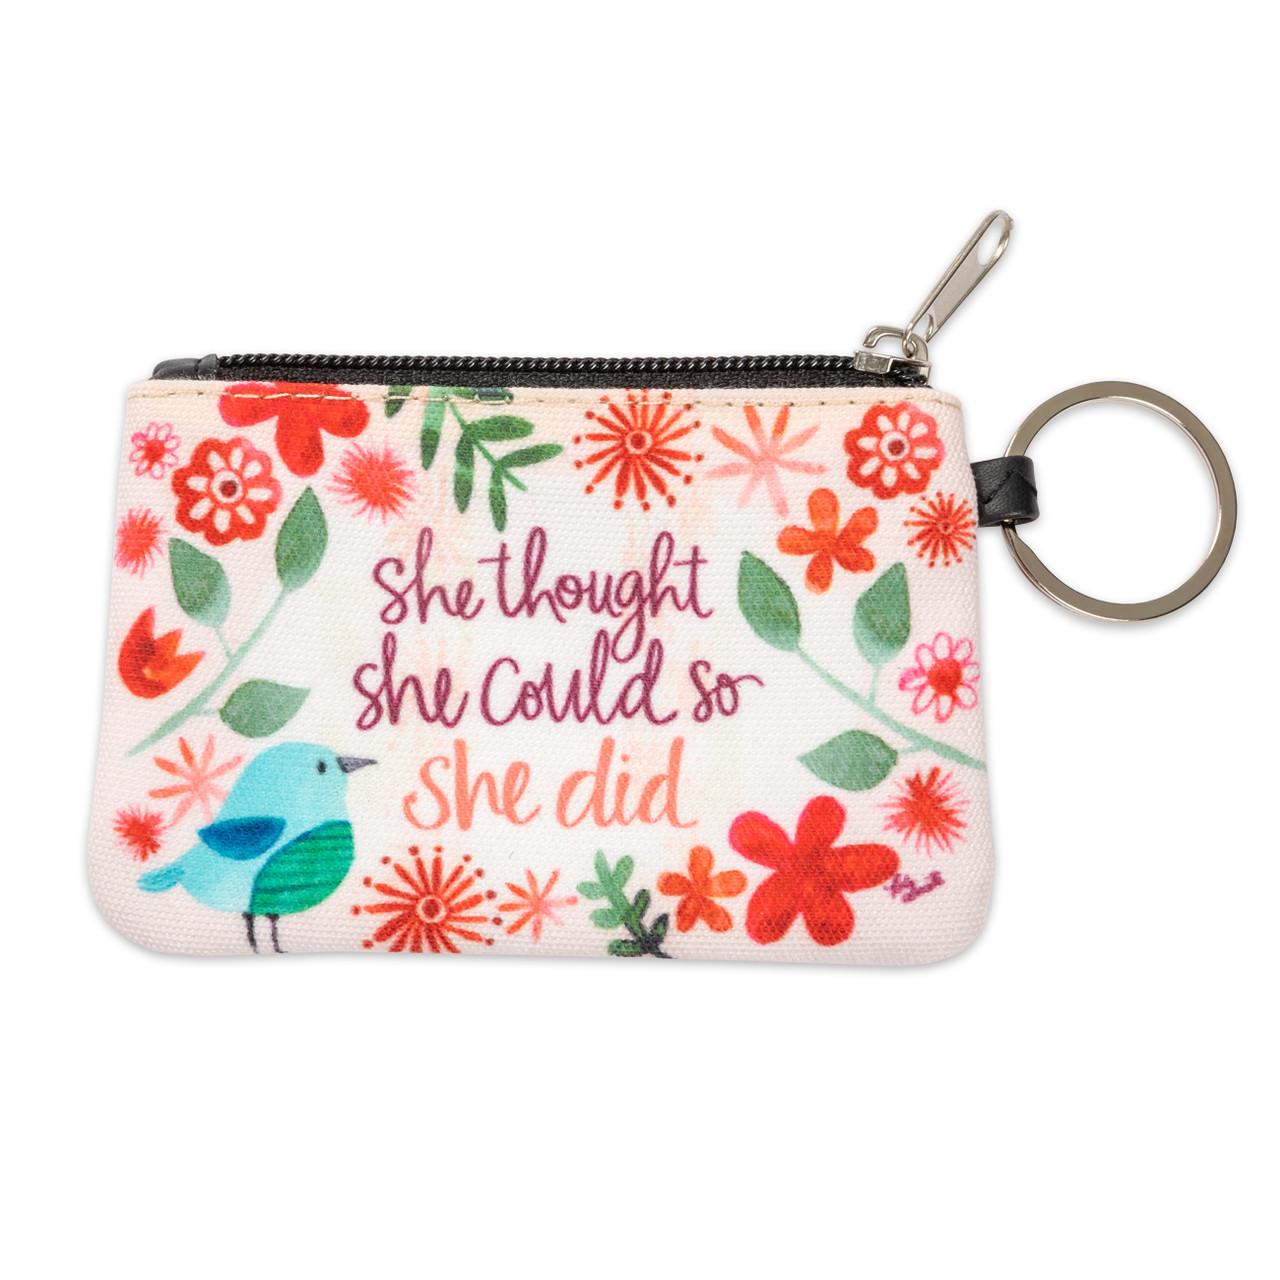 ID wallet keychain inspirational gift